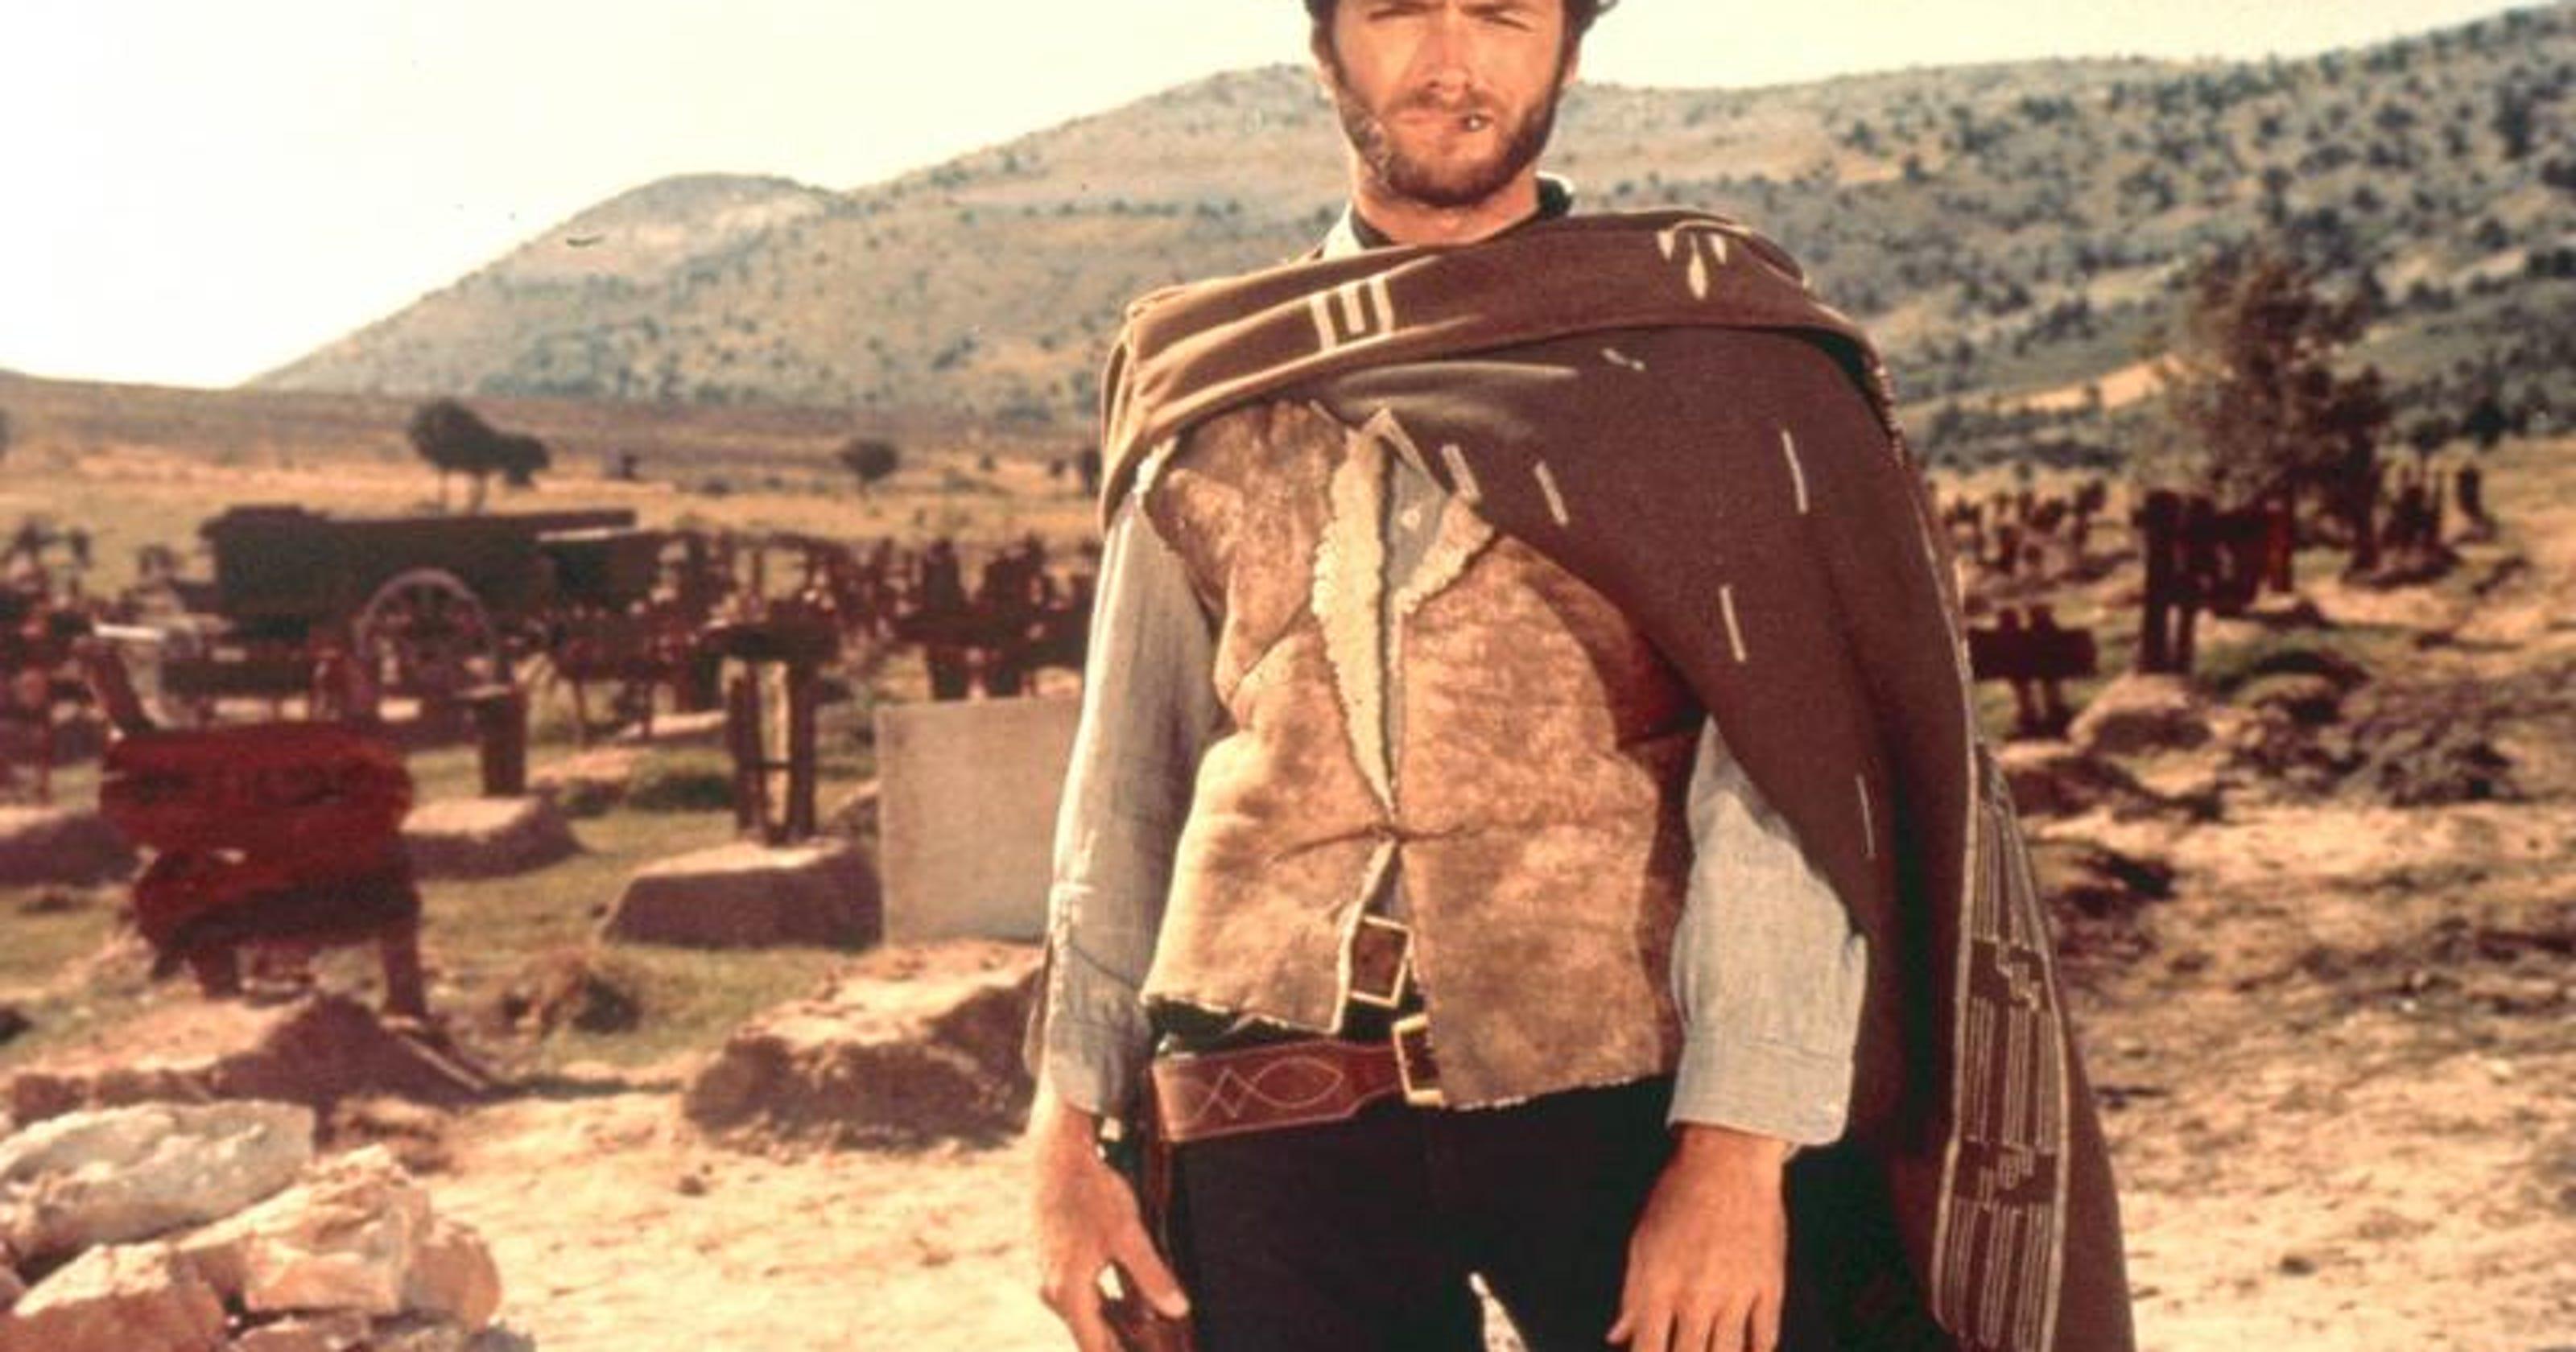 270e87332500d 10 top films from a long list of Clint Eastwood classics